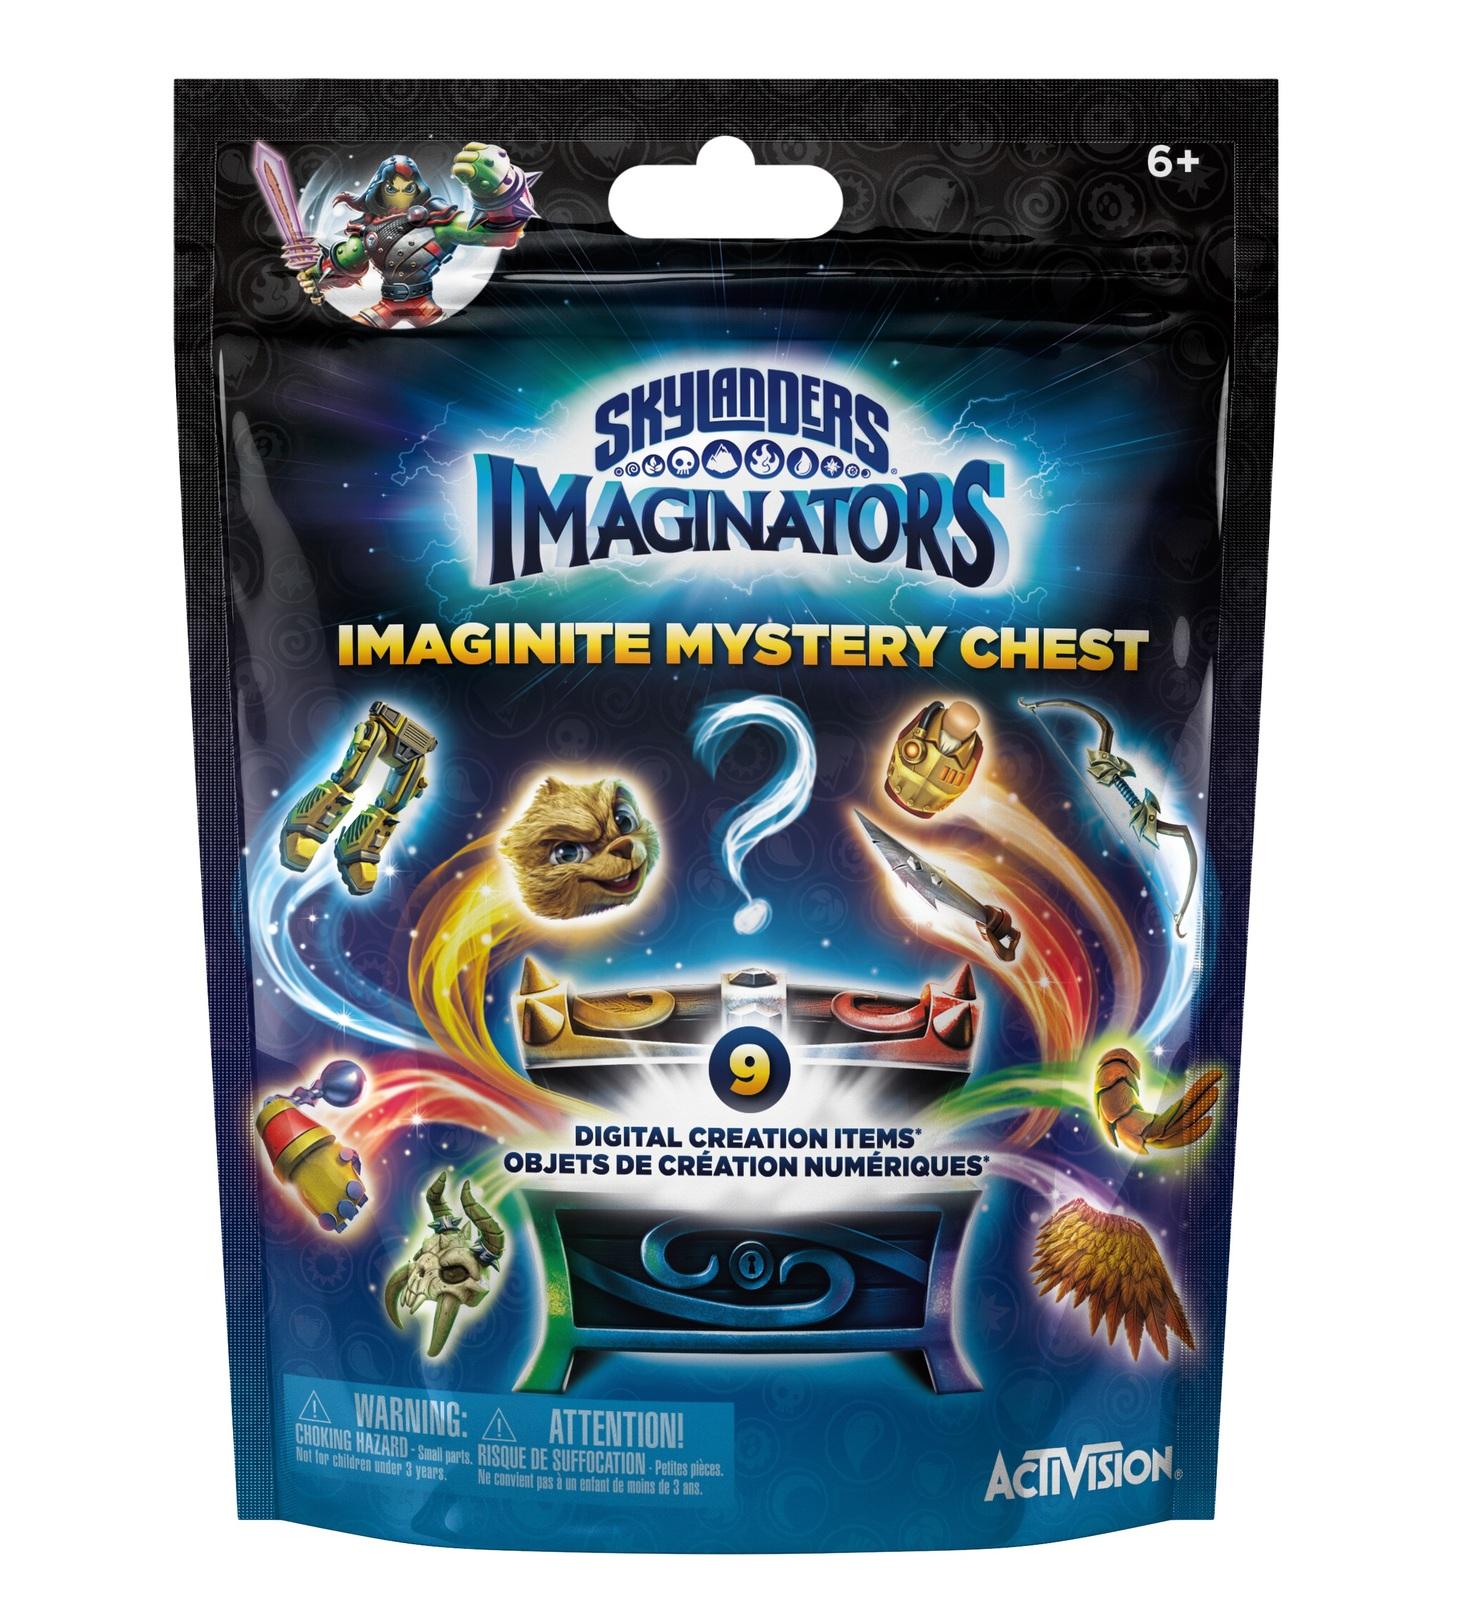 Skylanders Imaginators Mystery Chest (All Formats) for  image